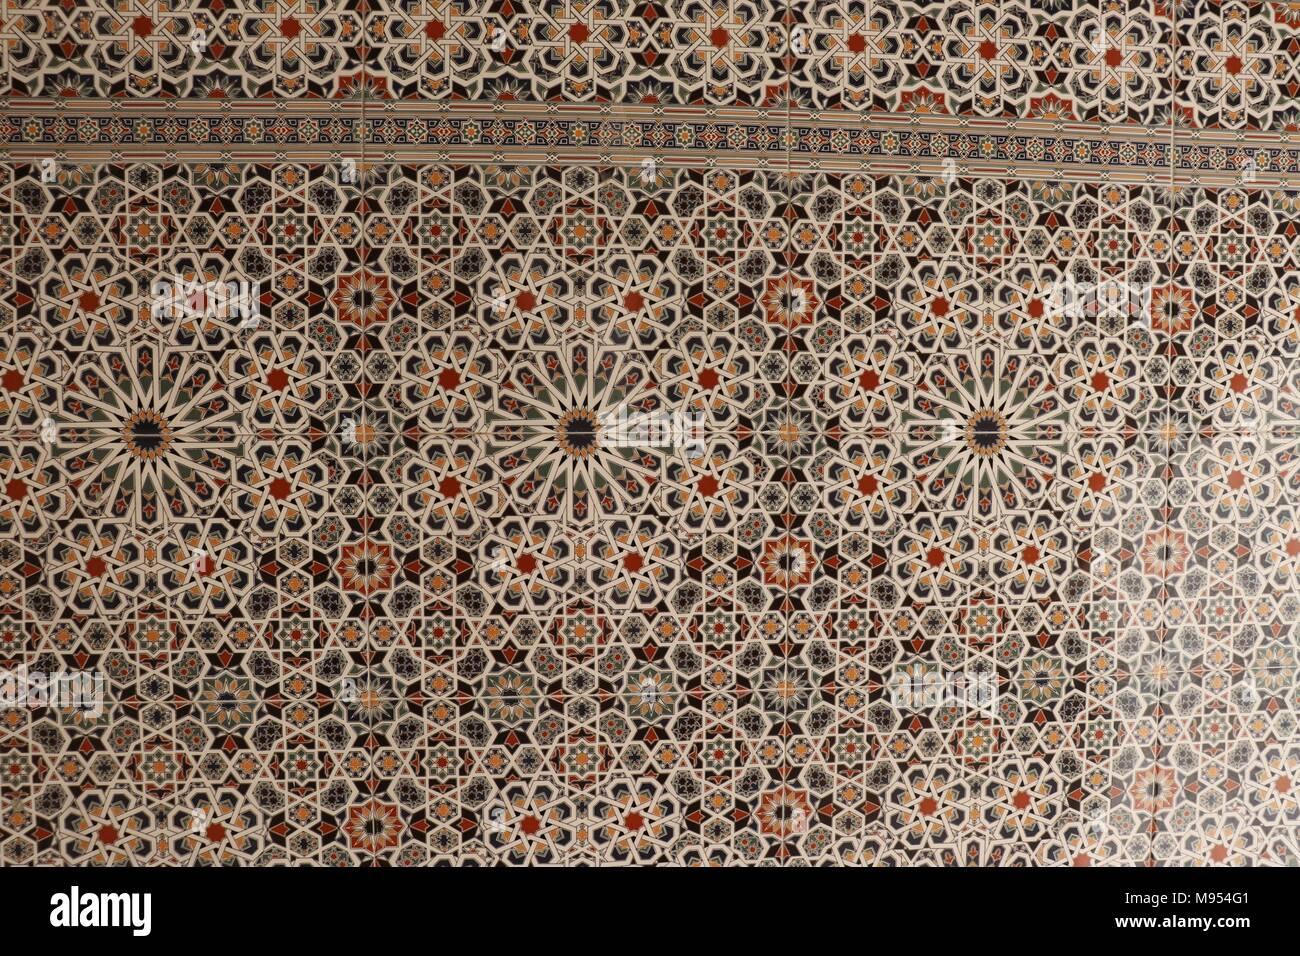 Decorative tiling immagini & decorative tiling fotos stock alamy